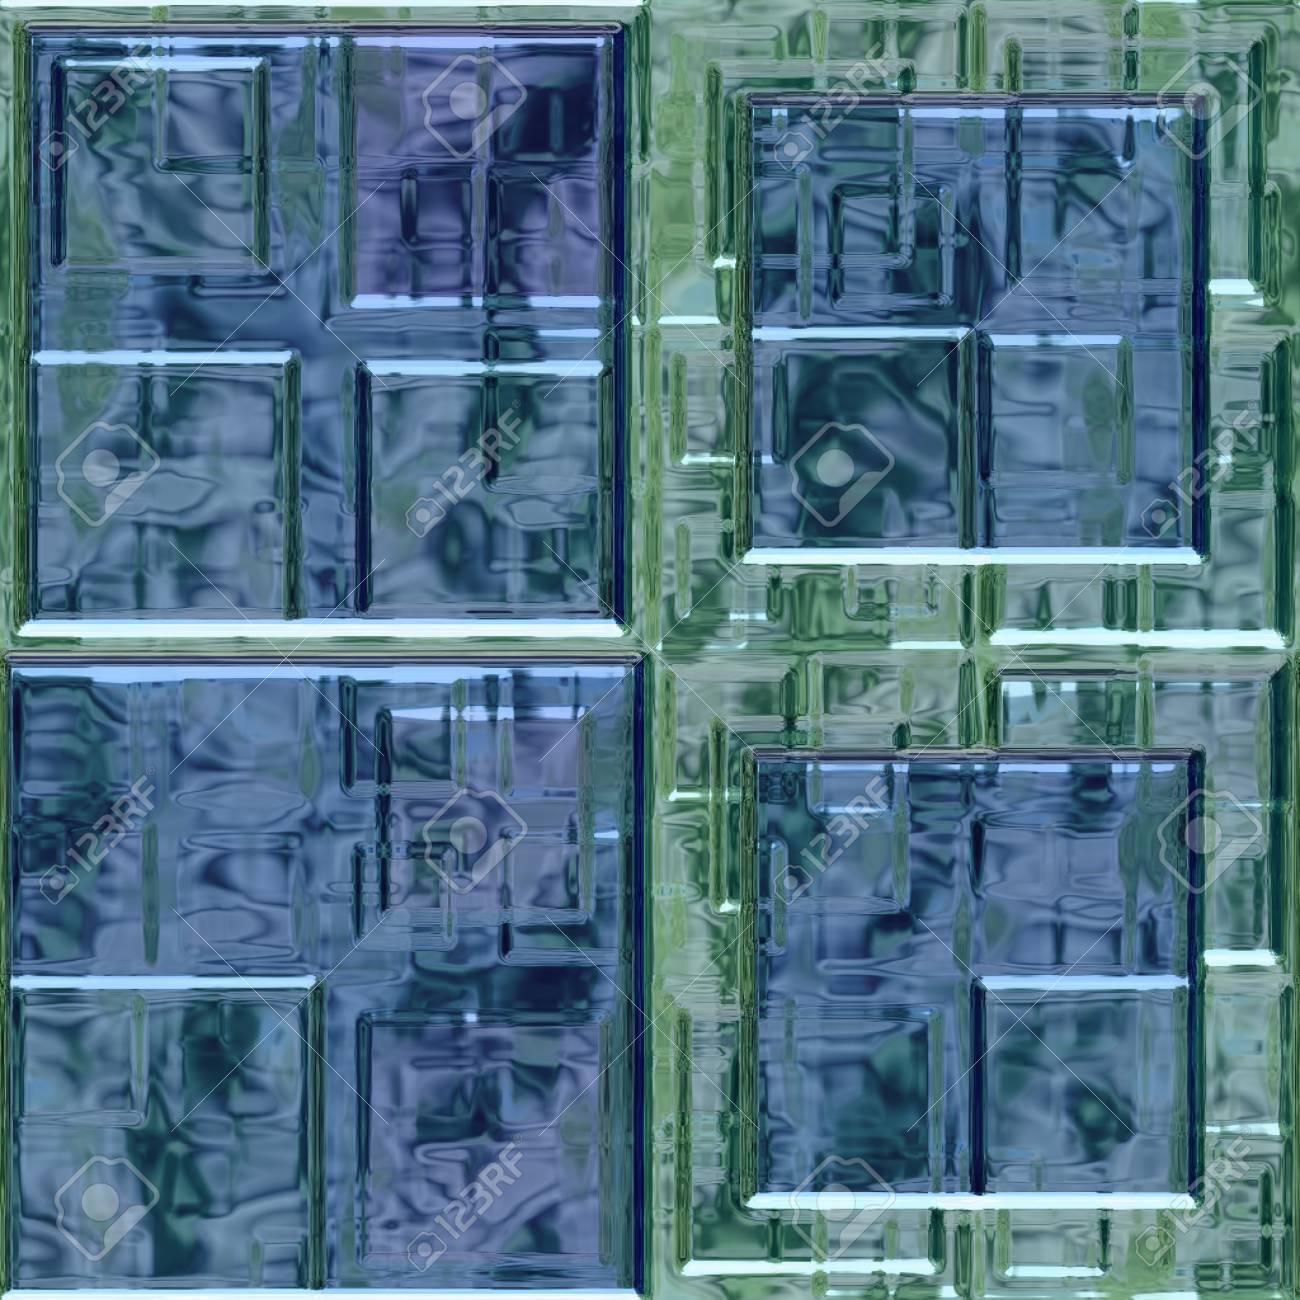 Vidrio O Cristal Transparente Textura Azulejos Decoracion - Vidrio-decoracion